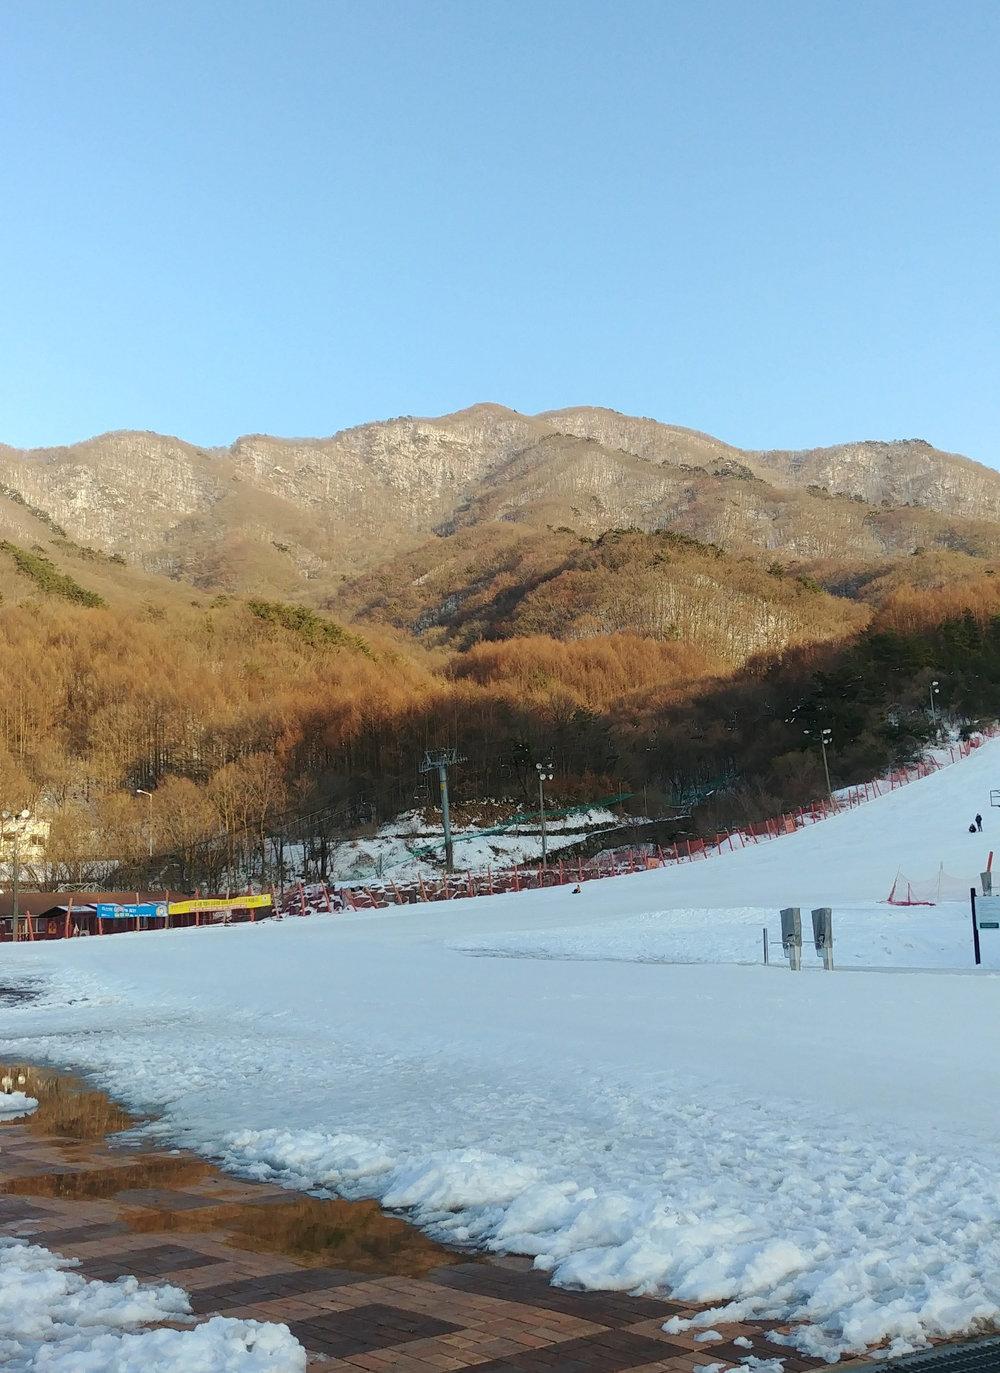 Snowboarding at     Muju     .